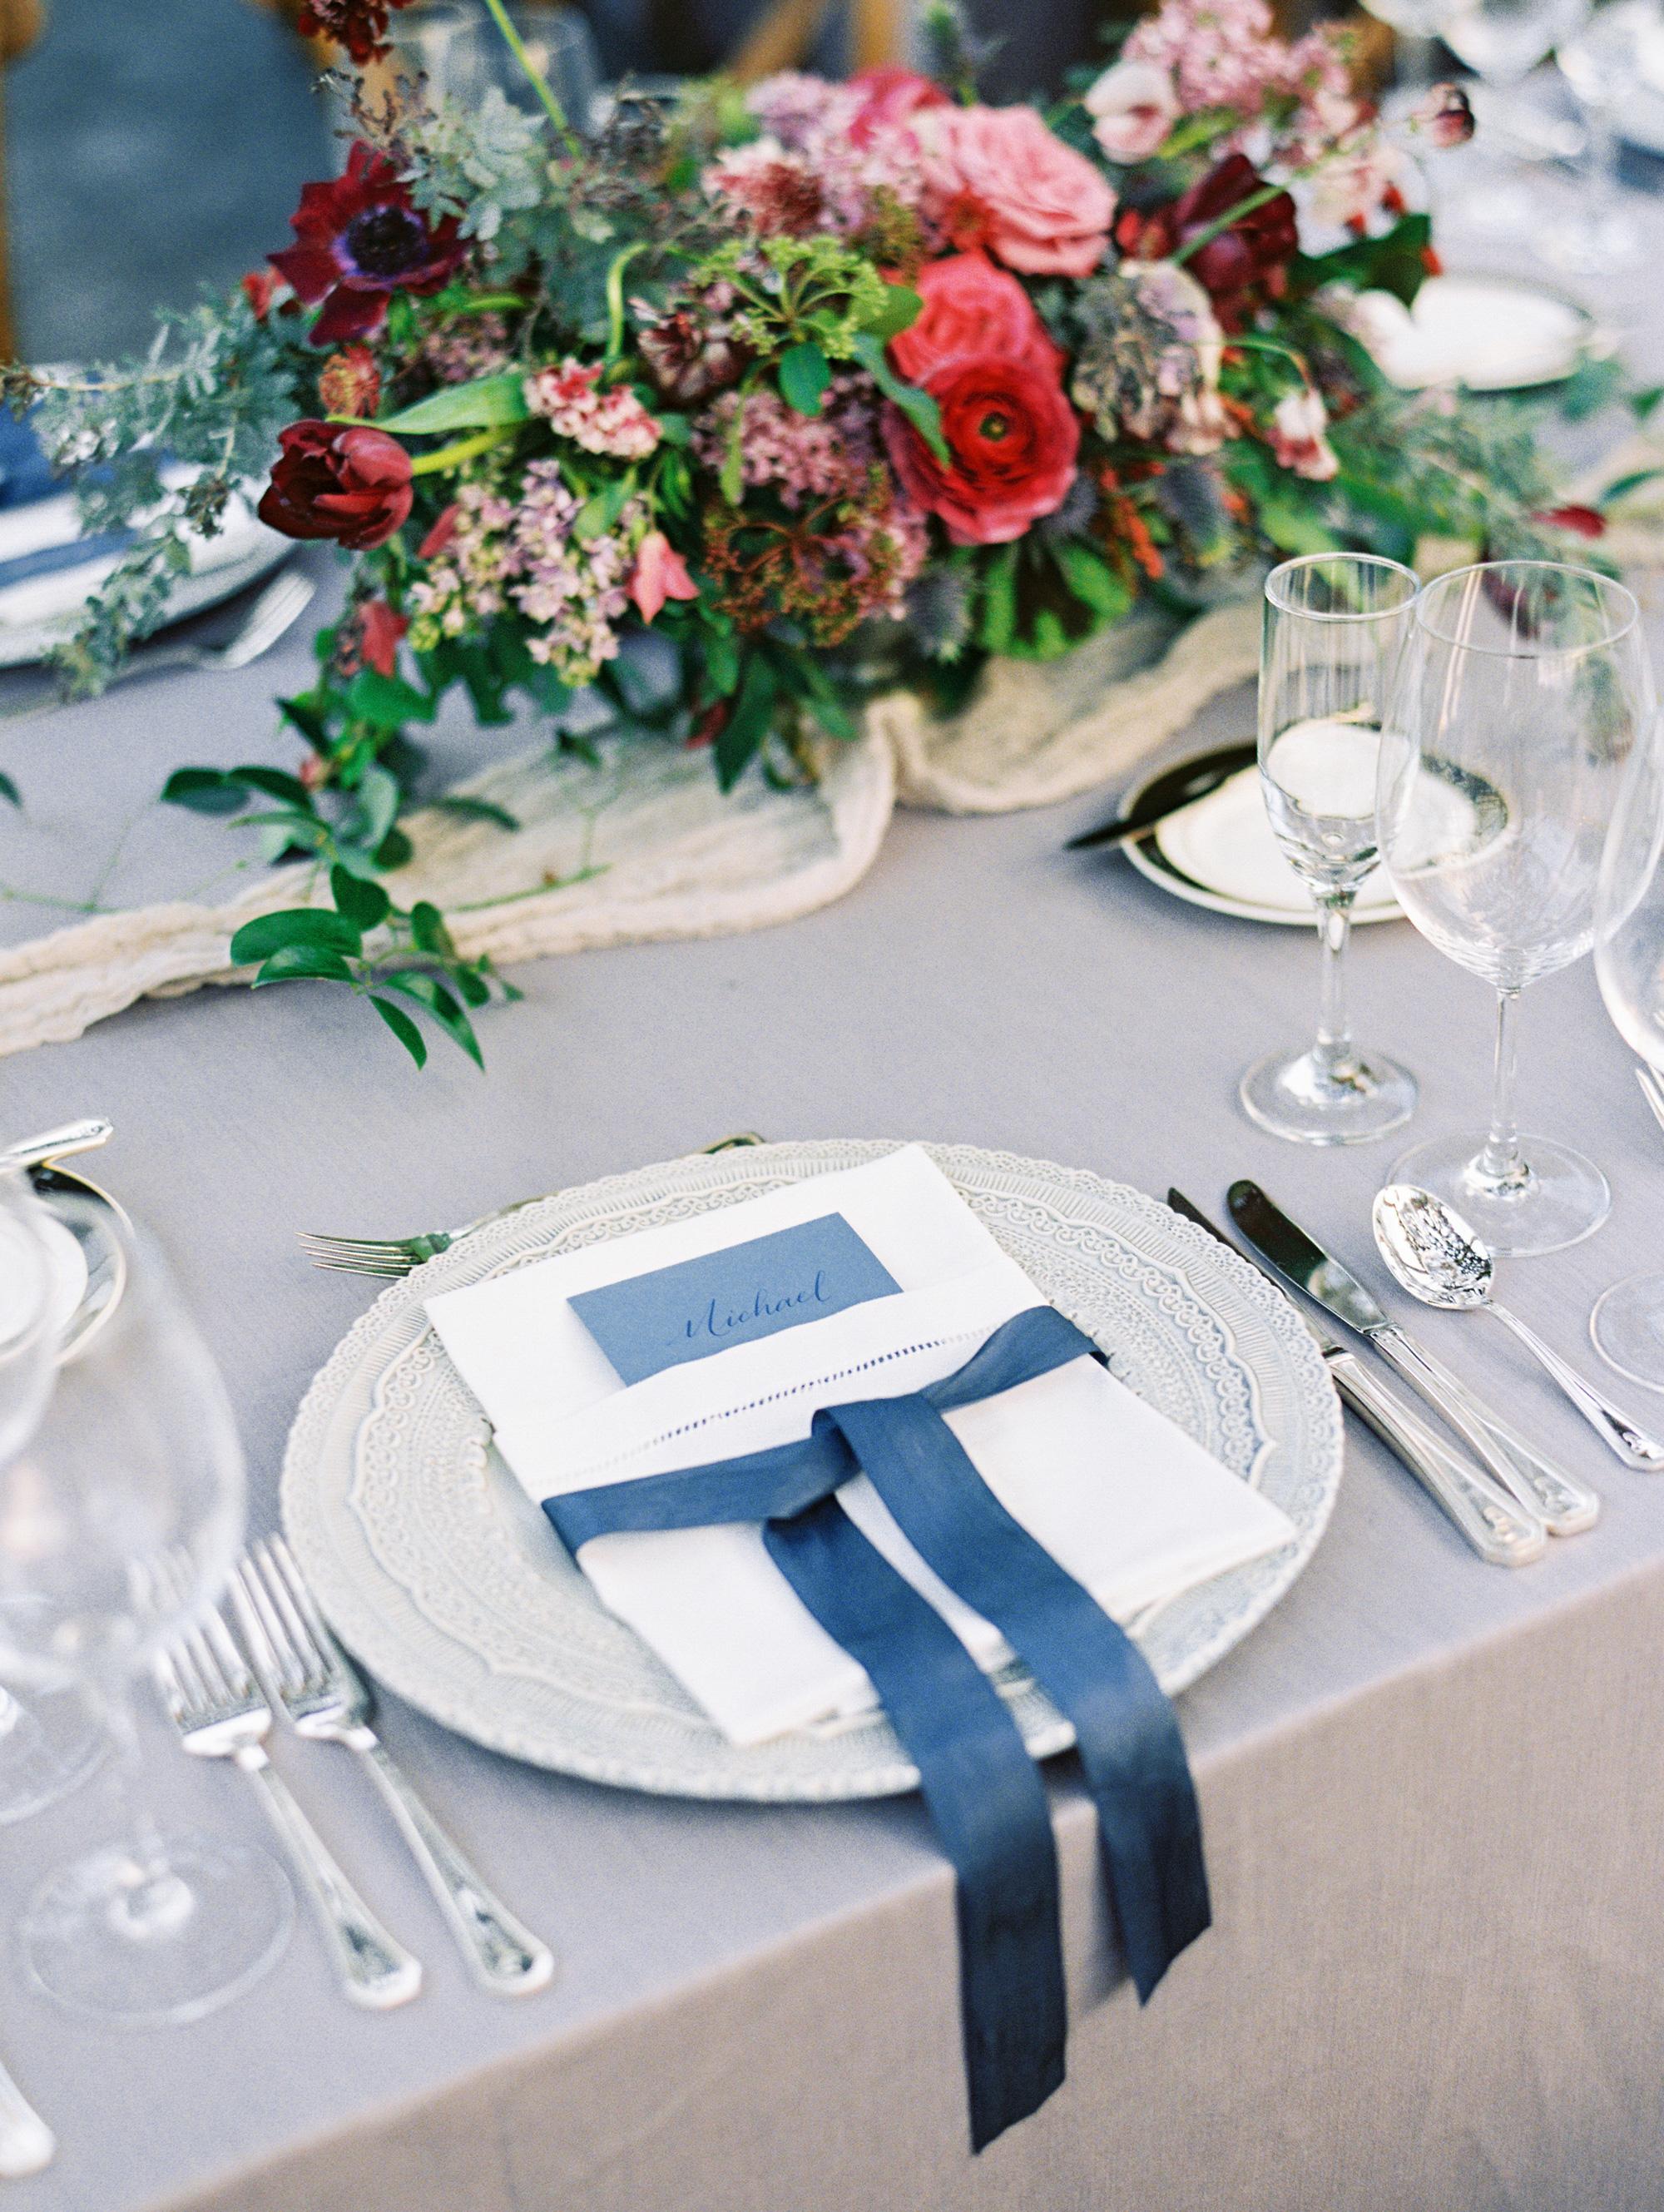 samantha michael wedding placesetting